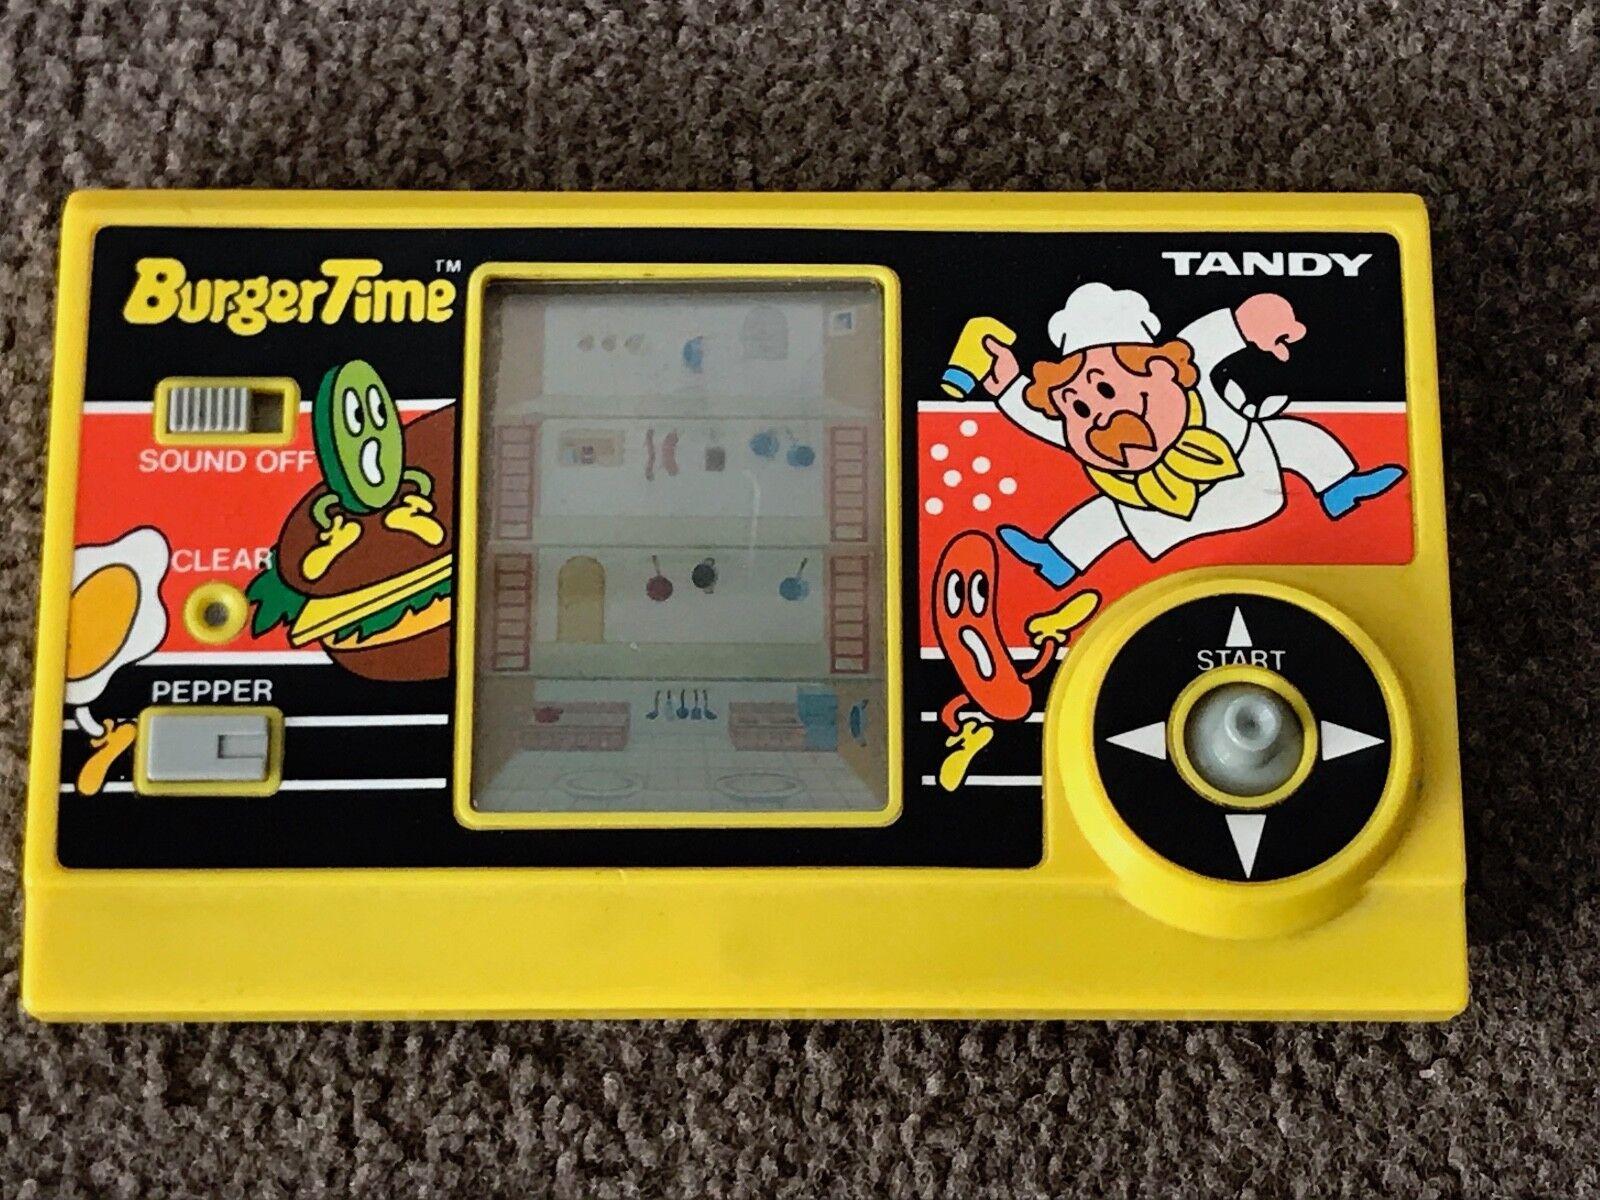 Tandy BurgerTimeElectronic Handheld, 1980s Original, Good Condition, Rare UK Ed